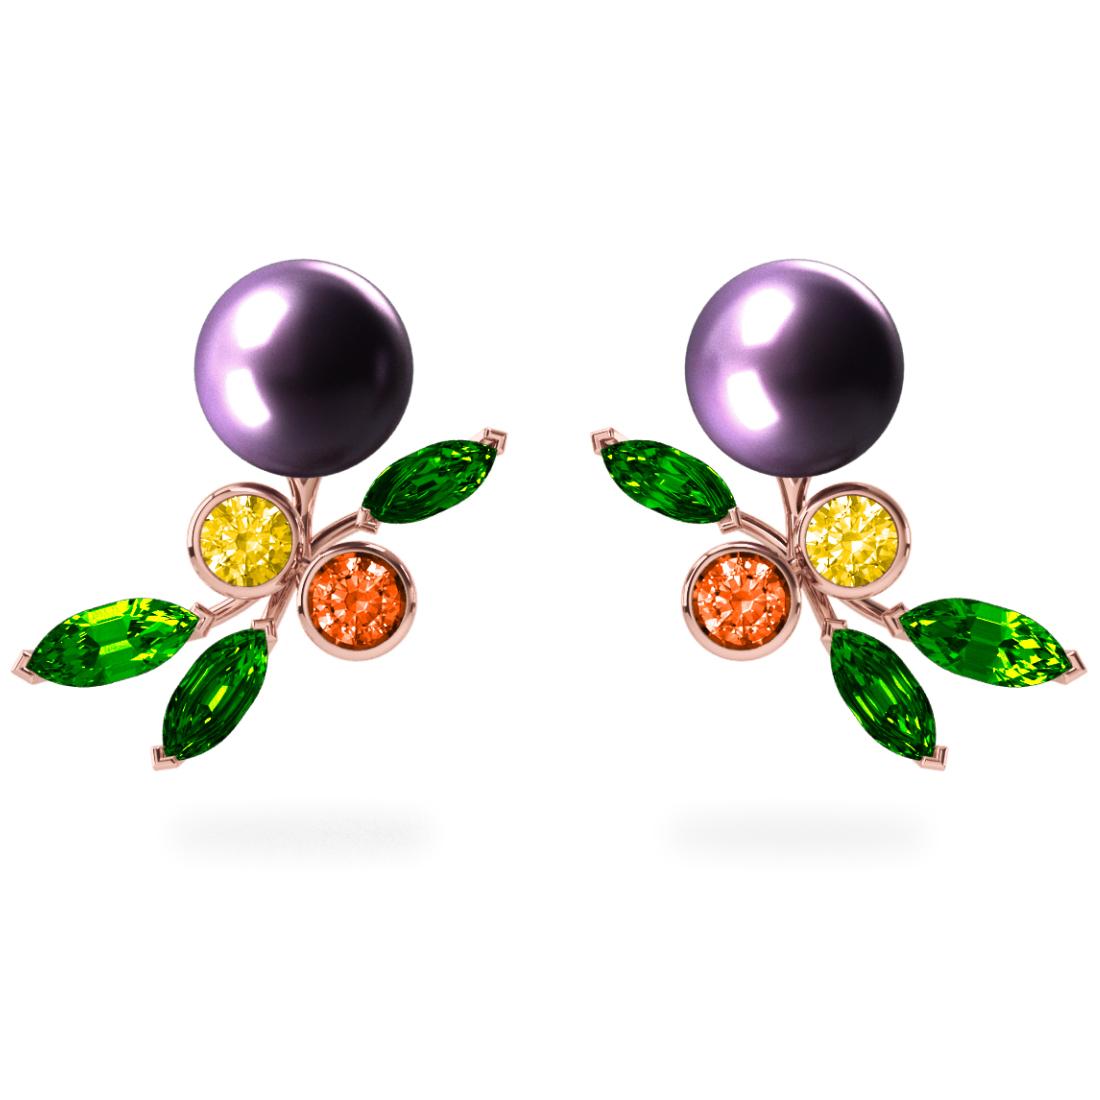 Boucles d'oreilles My Angel Aubergine - Saphirs, diamants, tsavorites & perles de Tahiti <br /> Or jaune 18 carats